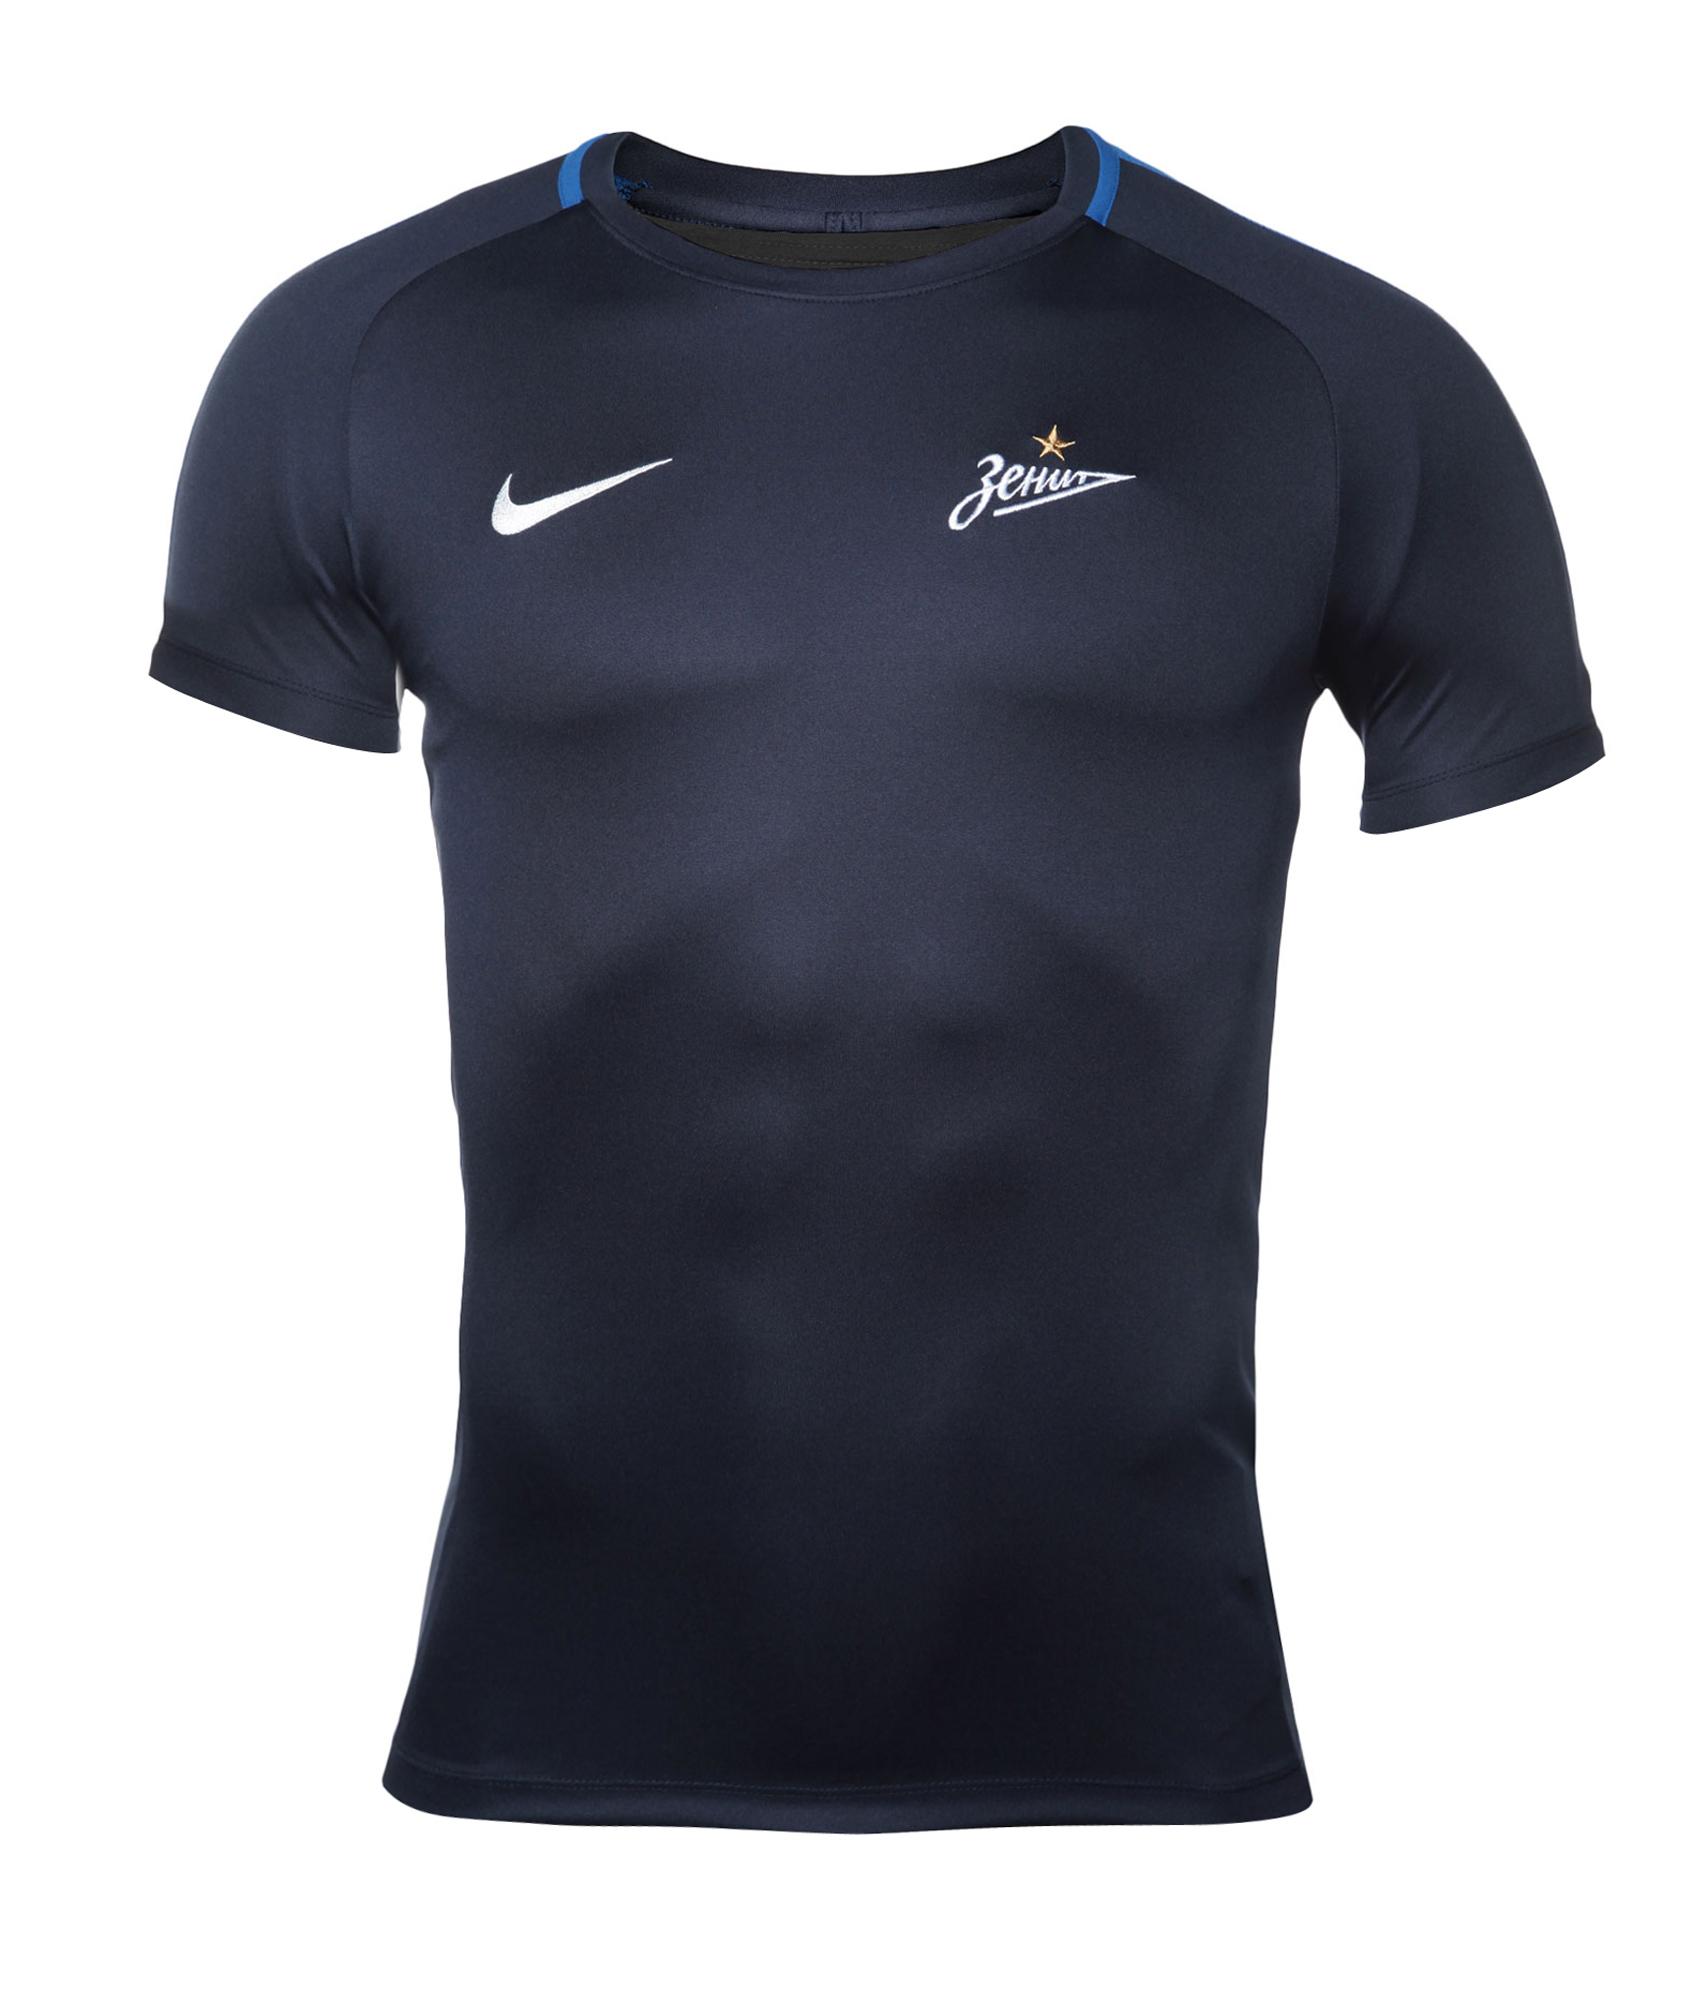 Футболка тренировочная Nike, Цвет-Темно-Синий, Размер-M поло nike цвет голубой размер m